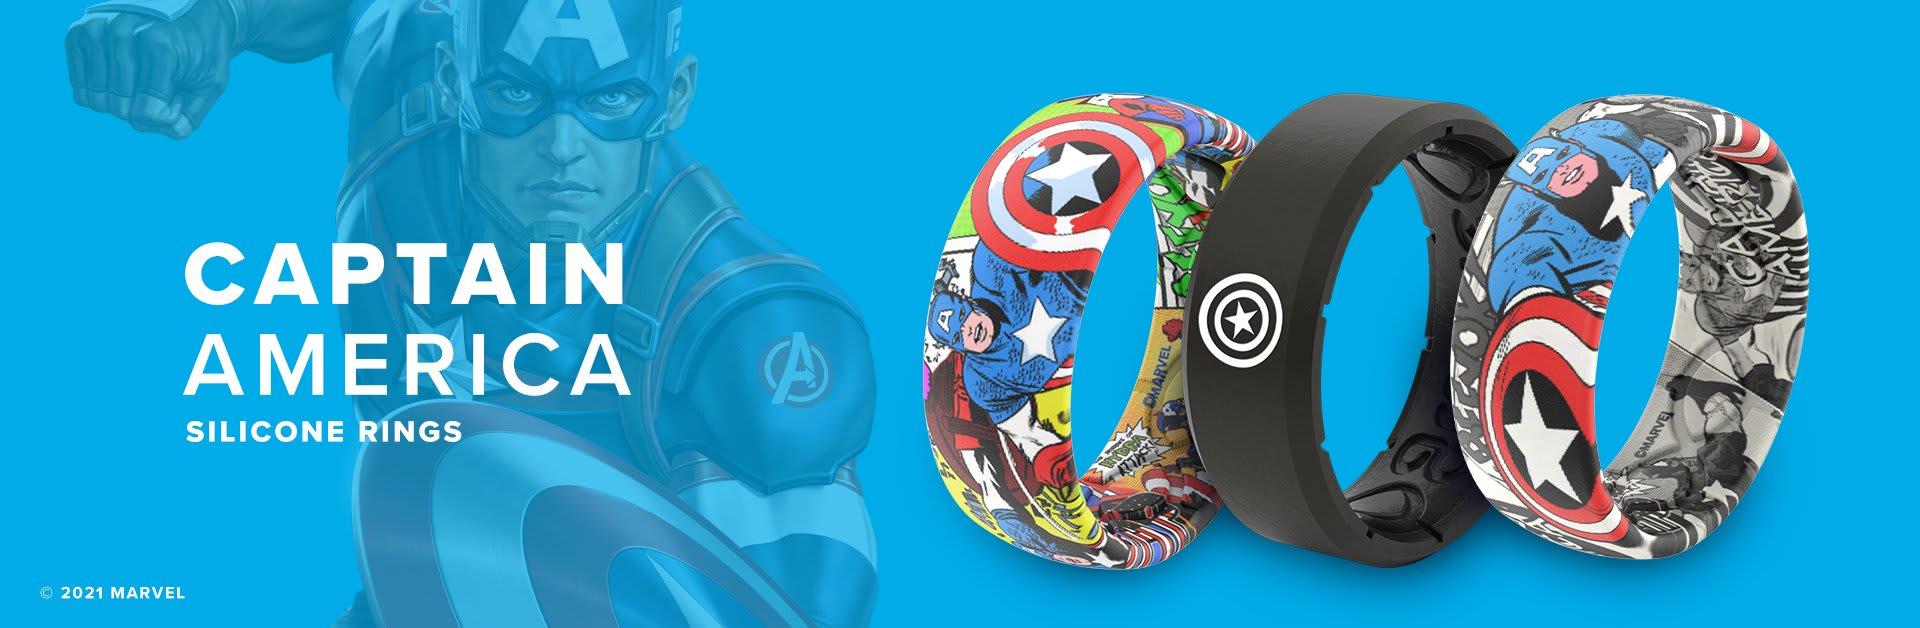 Captain America Silicone Rings